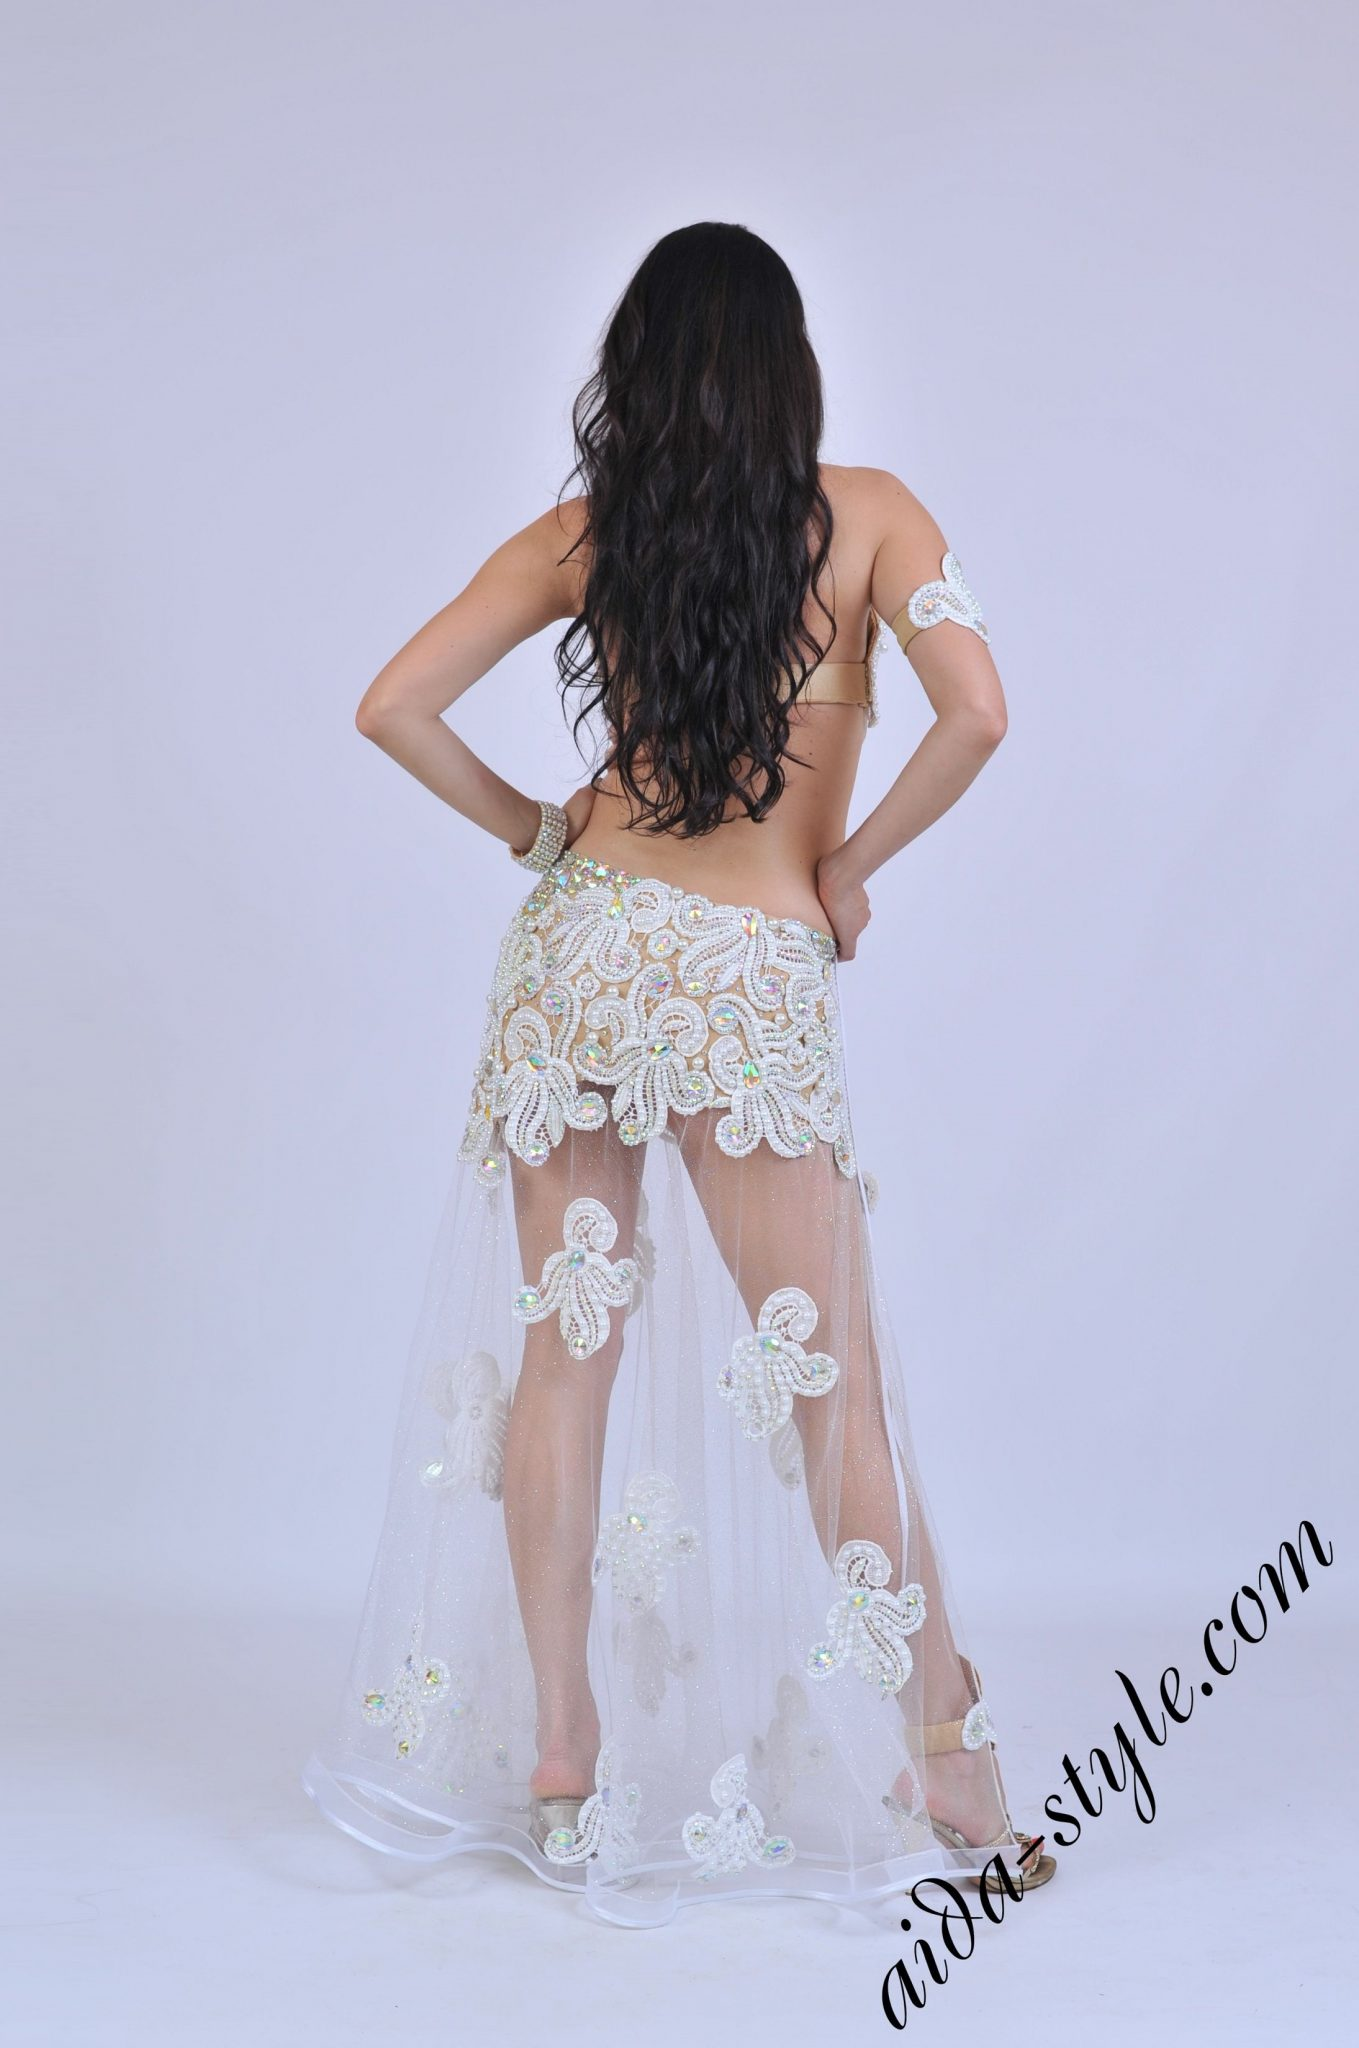 white-girl-dance-sexy